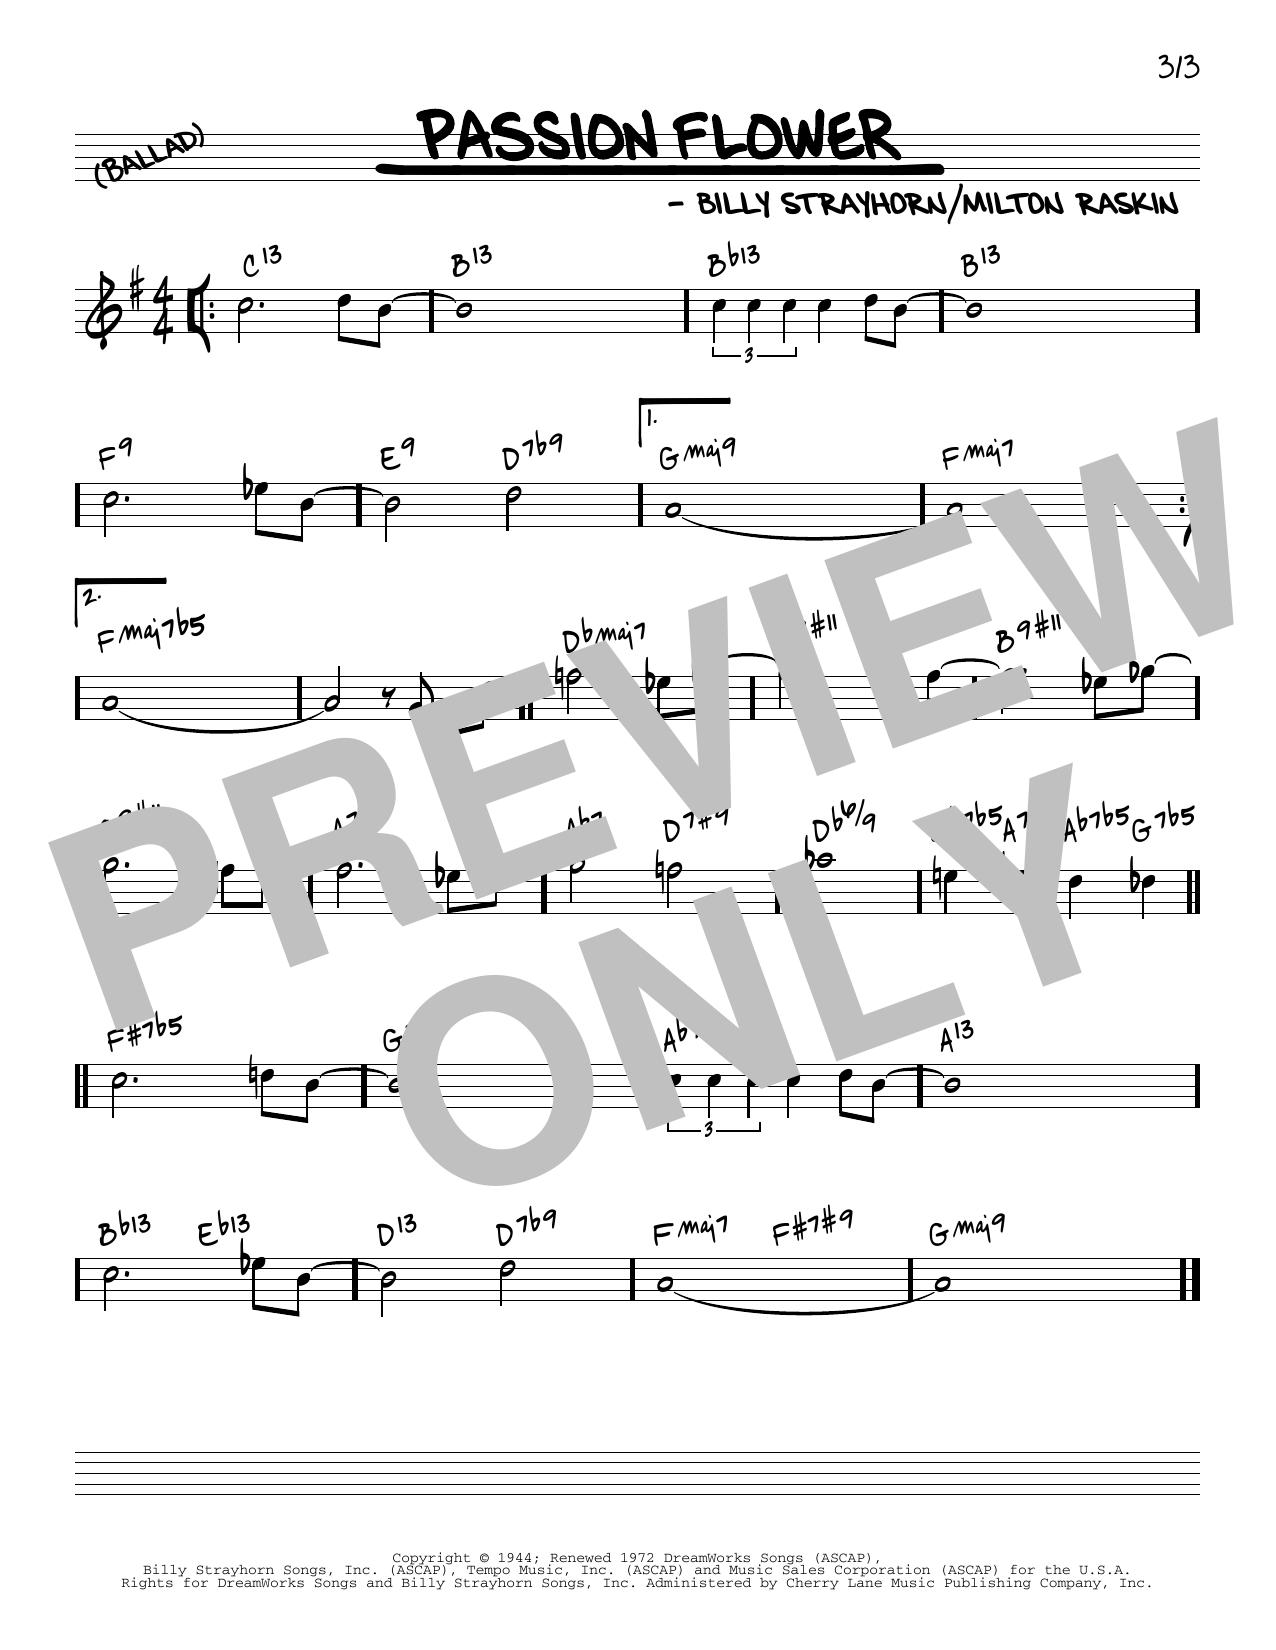 Billy Strayhorn Passion Flower [Reharmonized version] (arr. Jack Grassel) sheet music notes printable PDF score